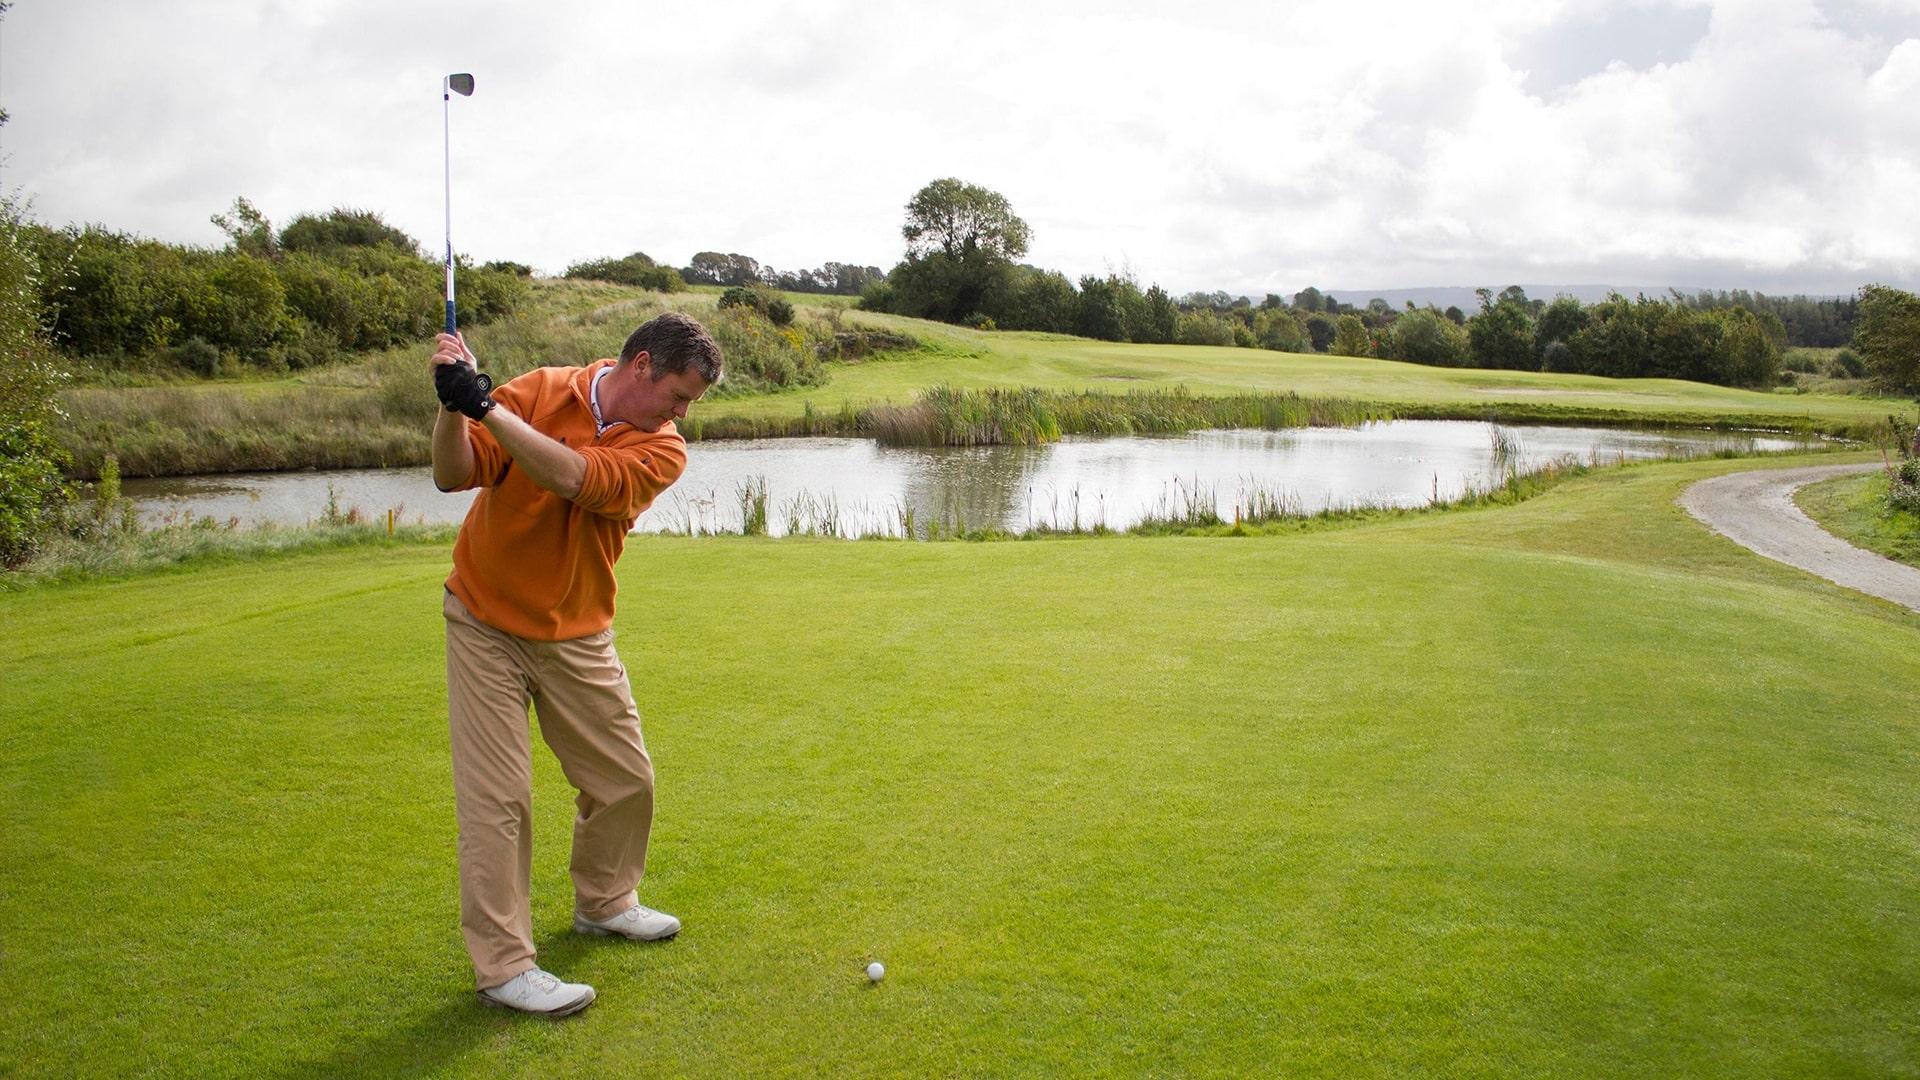 East_Clare_Golf_Village-golf-course-min